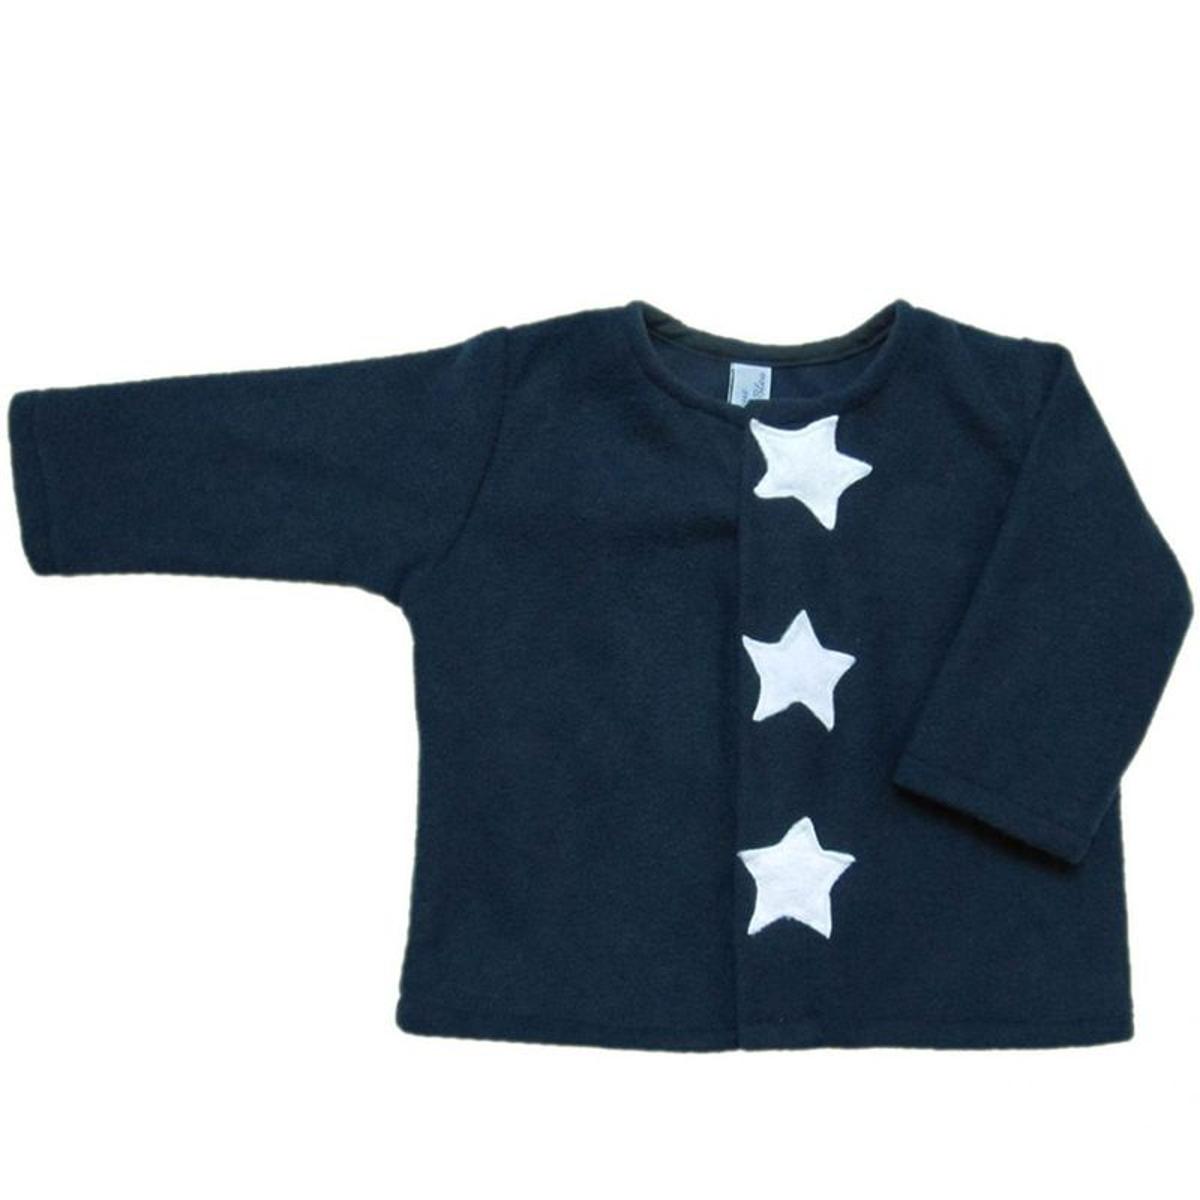 Gilet cardigan chaud étoiles appliquées 0 mois-2 ans Made in France